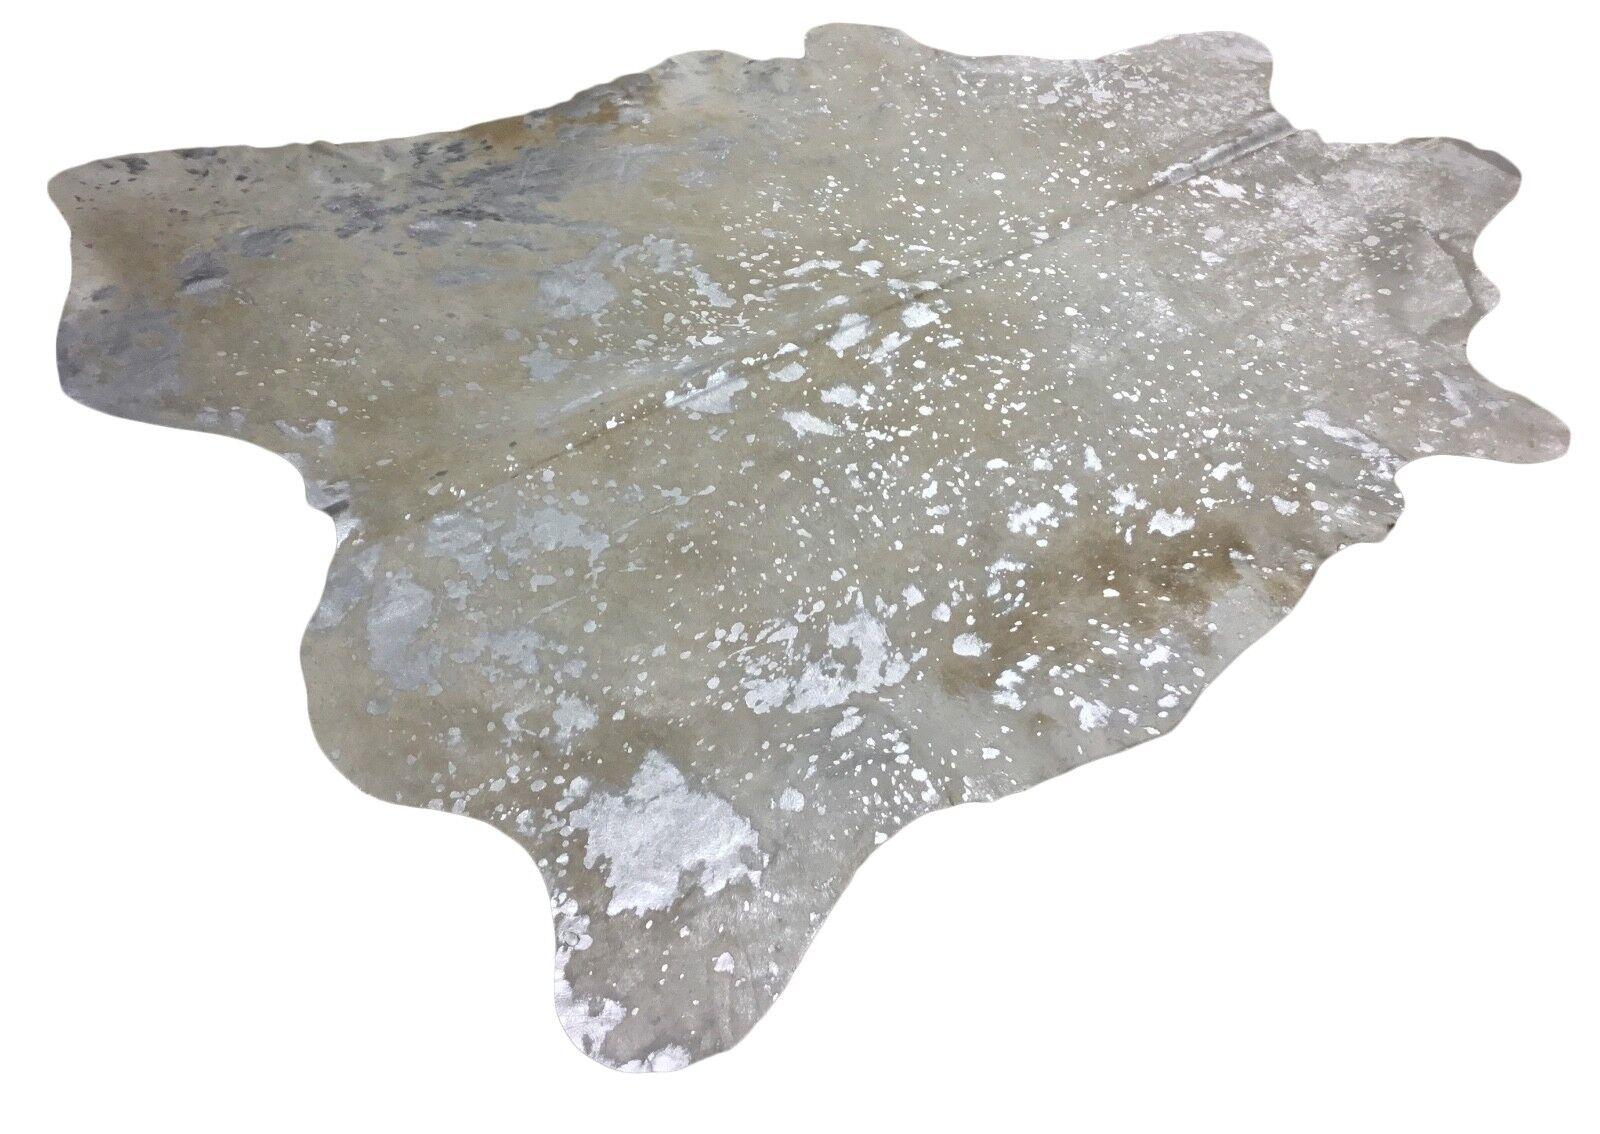 Peau rinderfell Metallic gris clair/beige argent-environ 225 cm cm, X 194 cm, cm Neuf, rug fec5c1